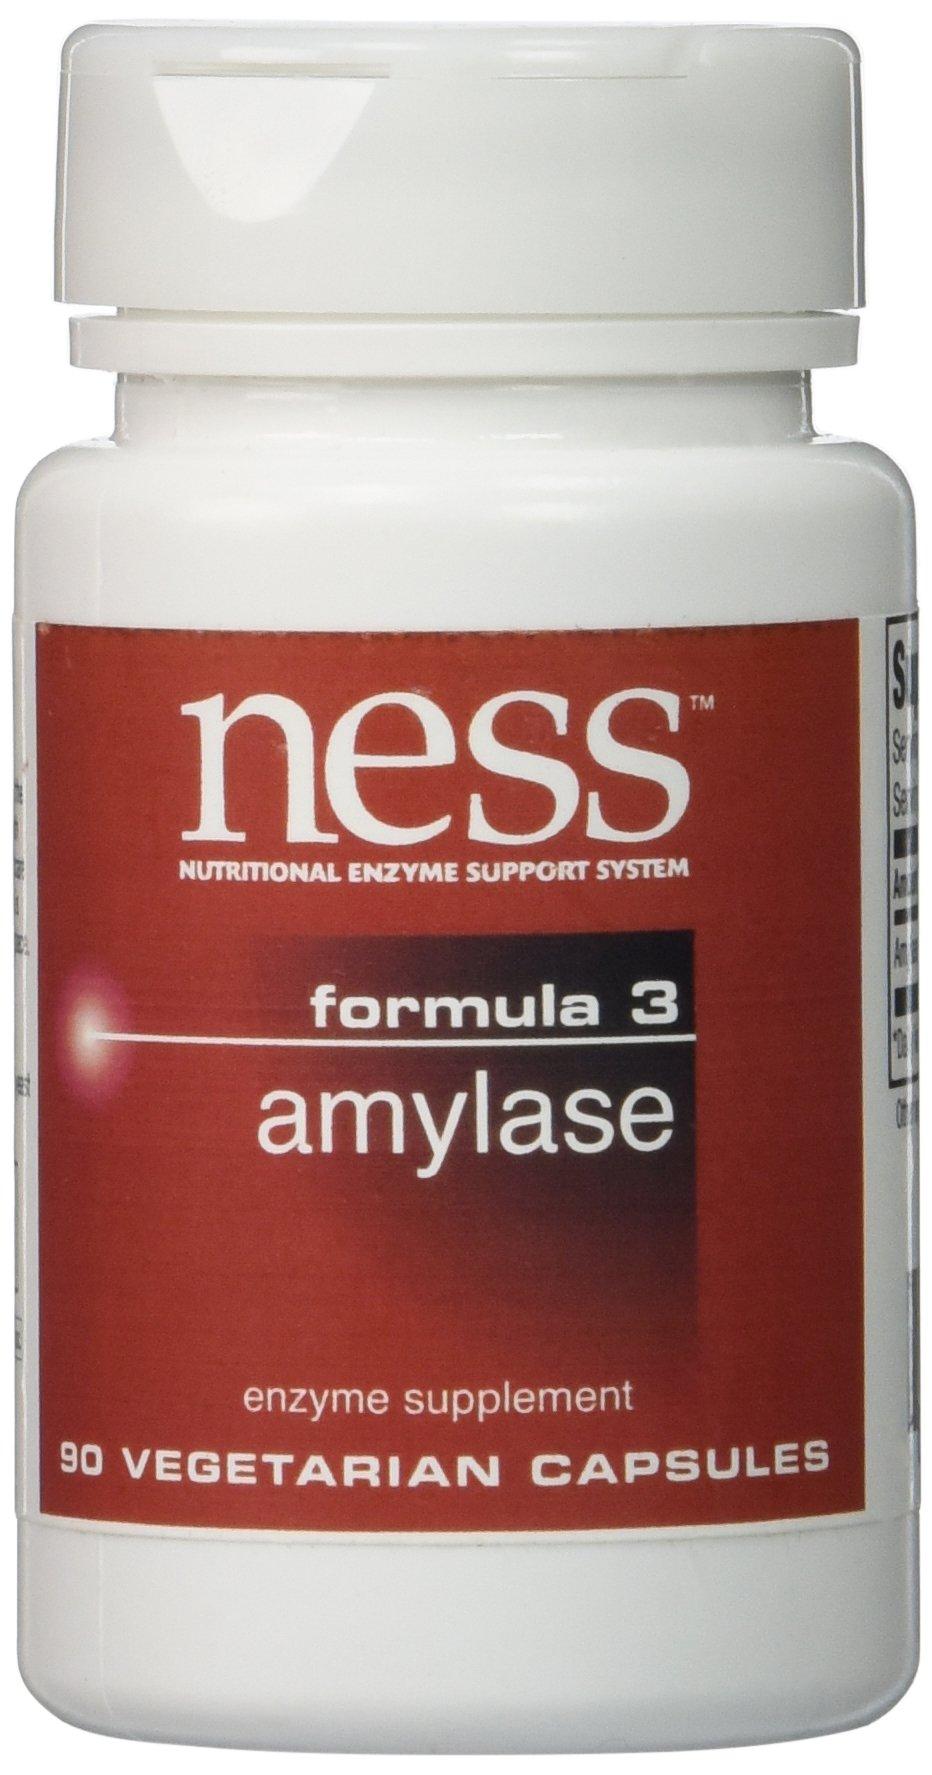 NESS Enzymes - Amylase #3 90 VegiCaps